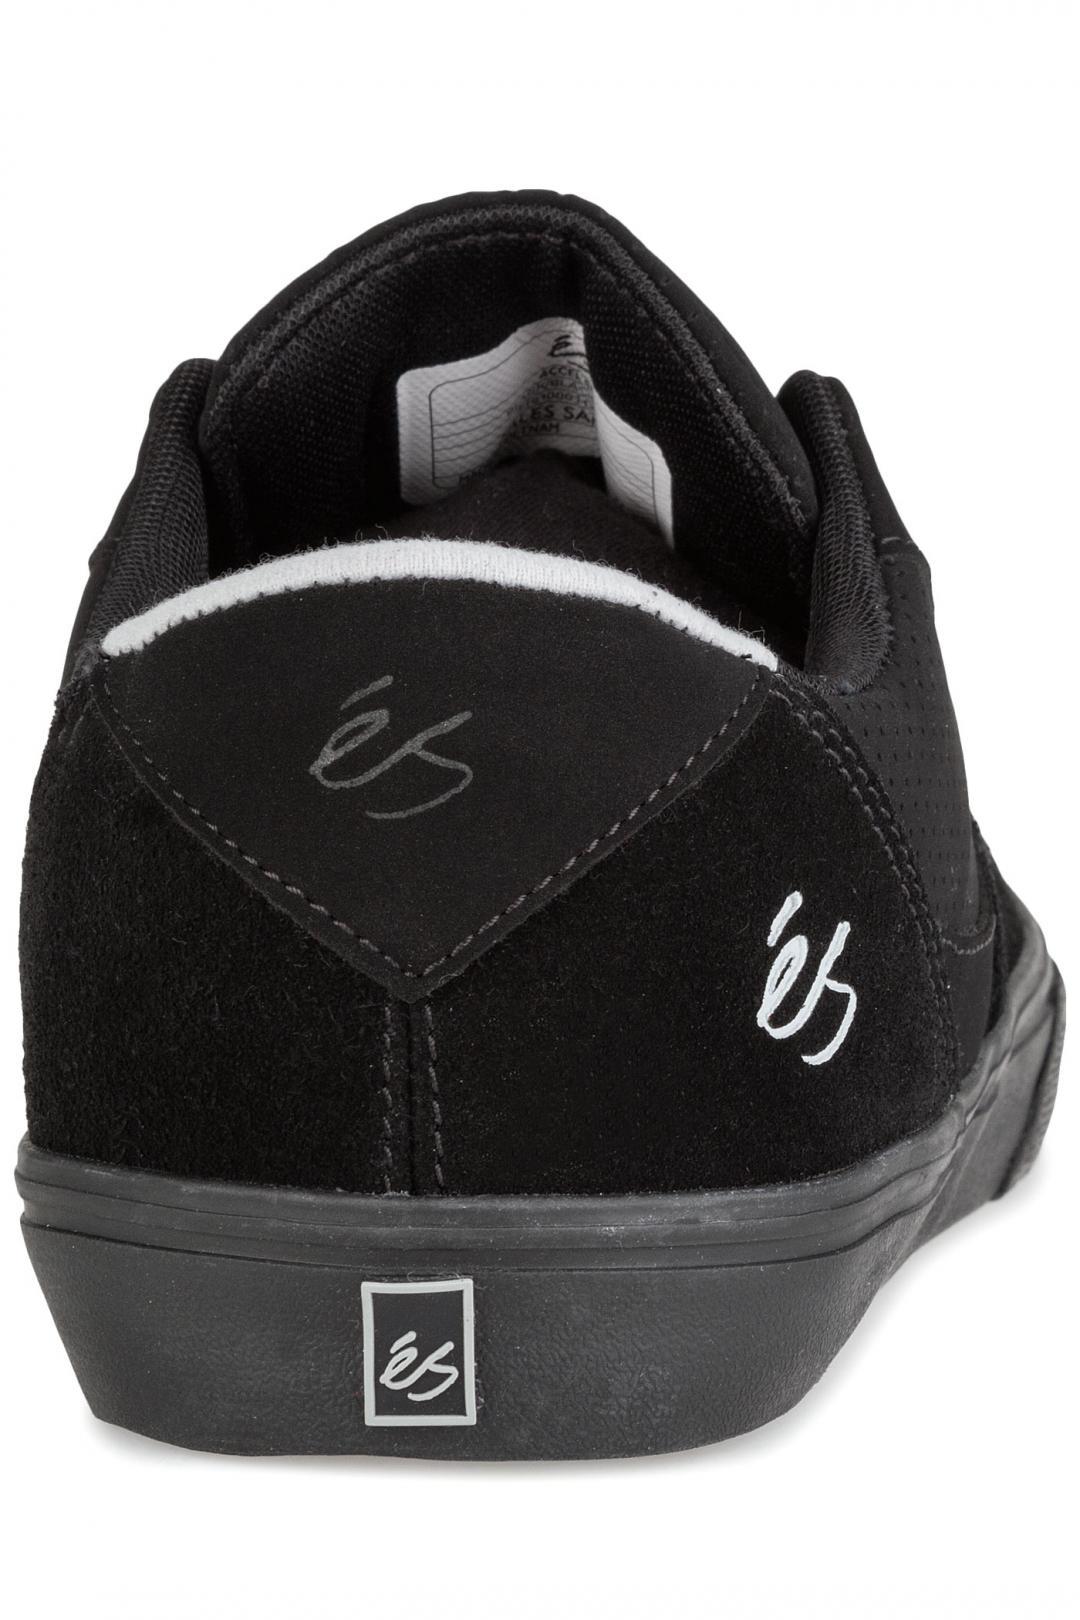 Uomo éS Accel SQ black black grey | Sneaker